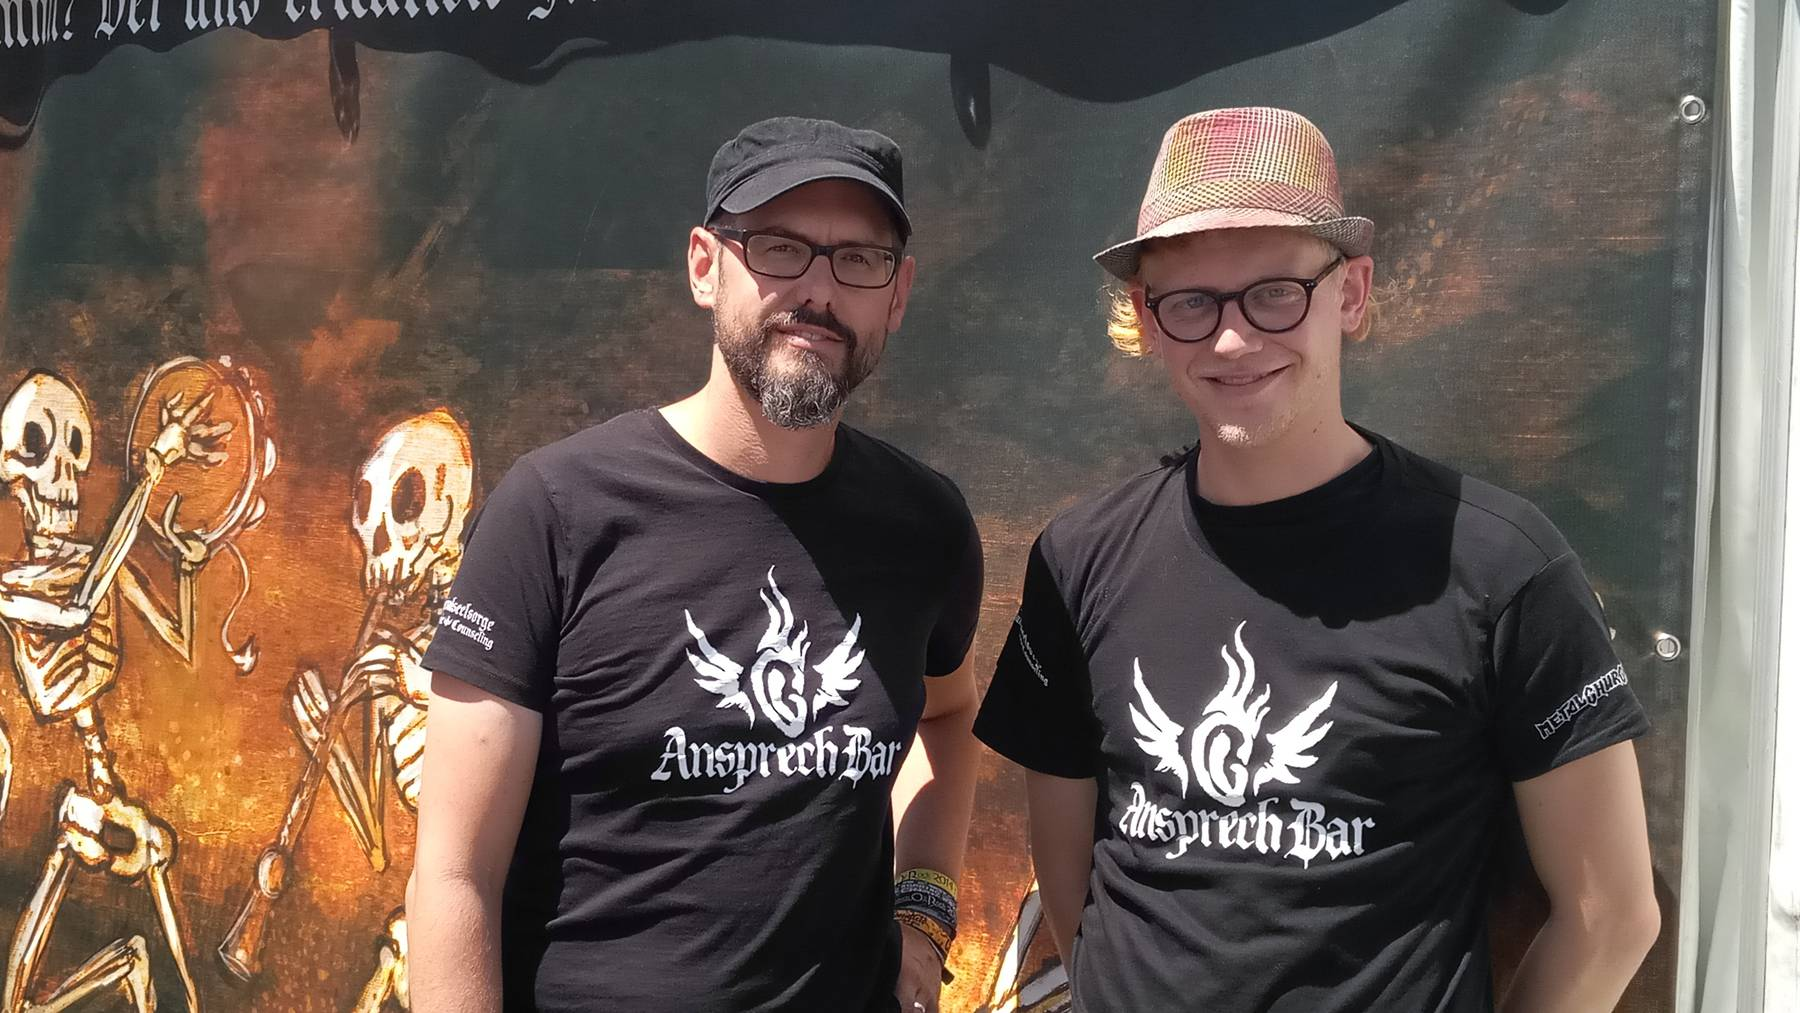 Pfarrer Samuel Hug und sein Teamkollege Sebastian Rüthy sind selbst Heavy-Metal-Fans.